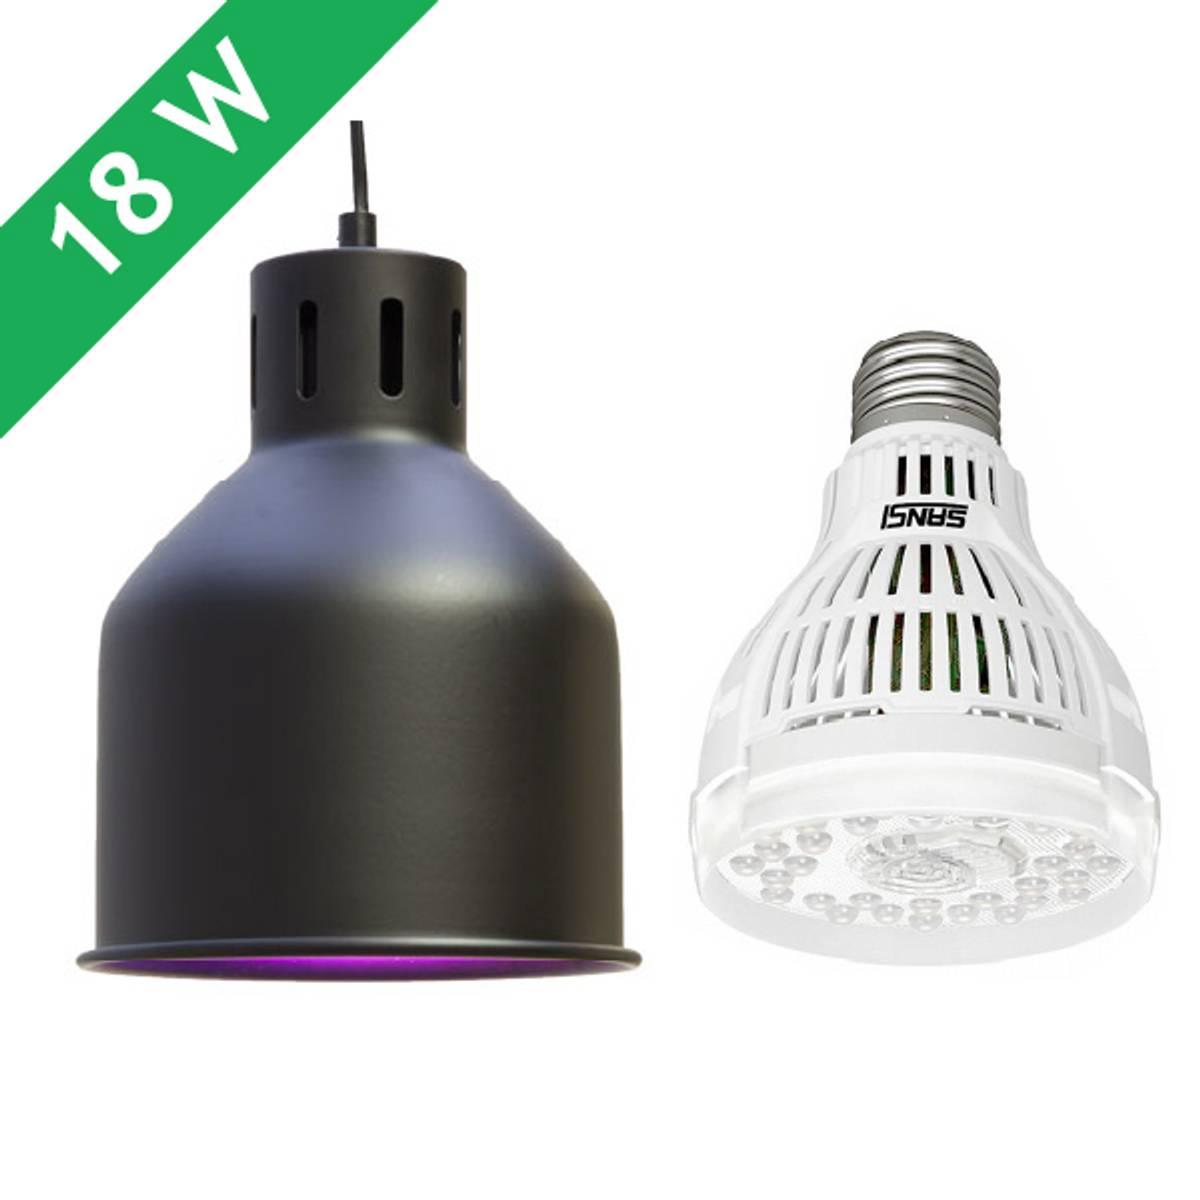 Saga armatur 'svart' med LED-pære 15 W